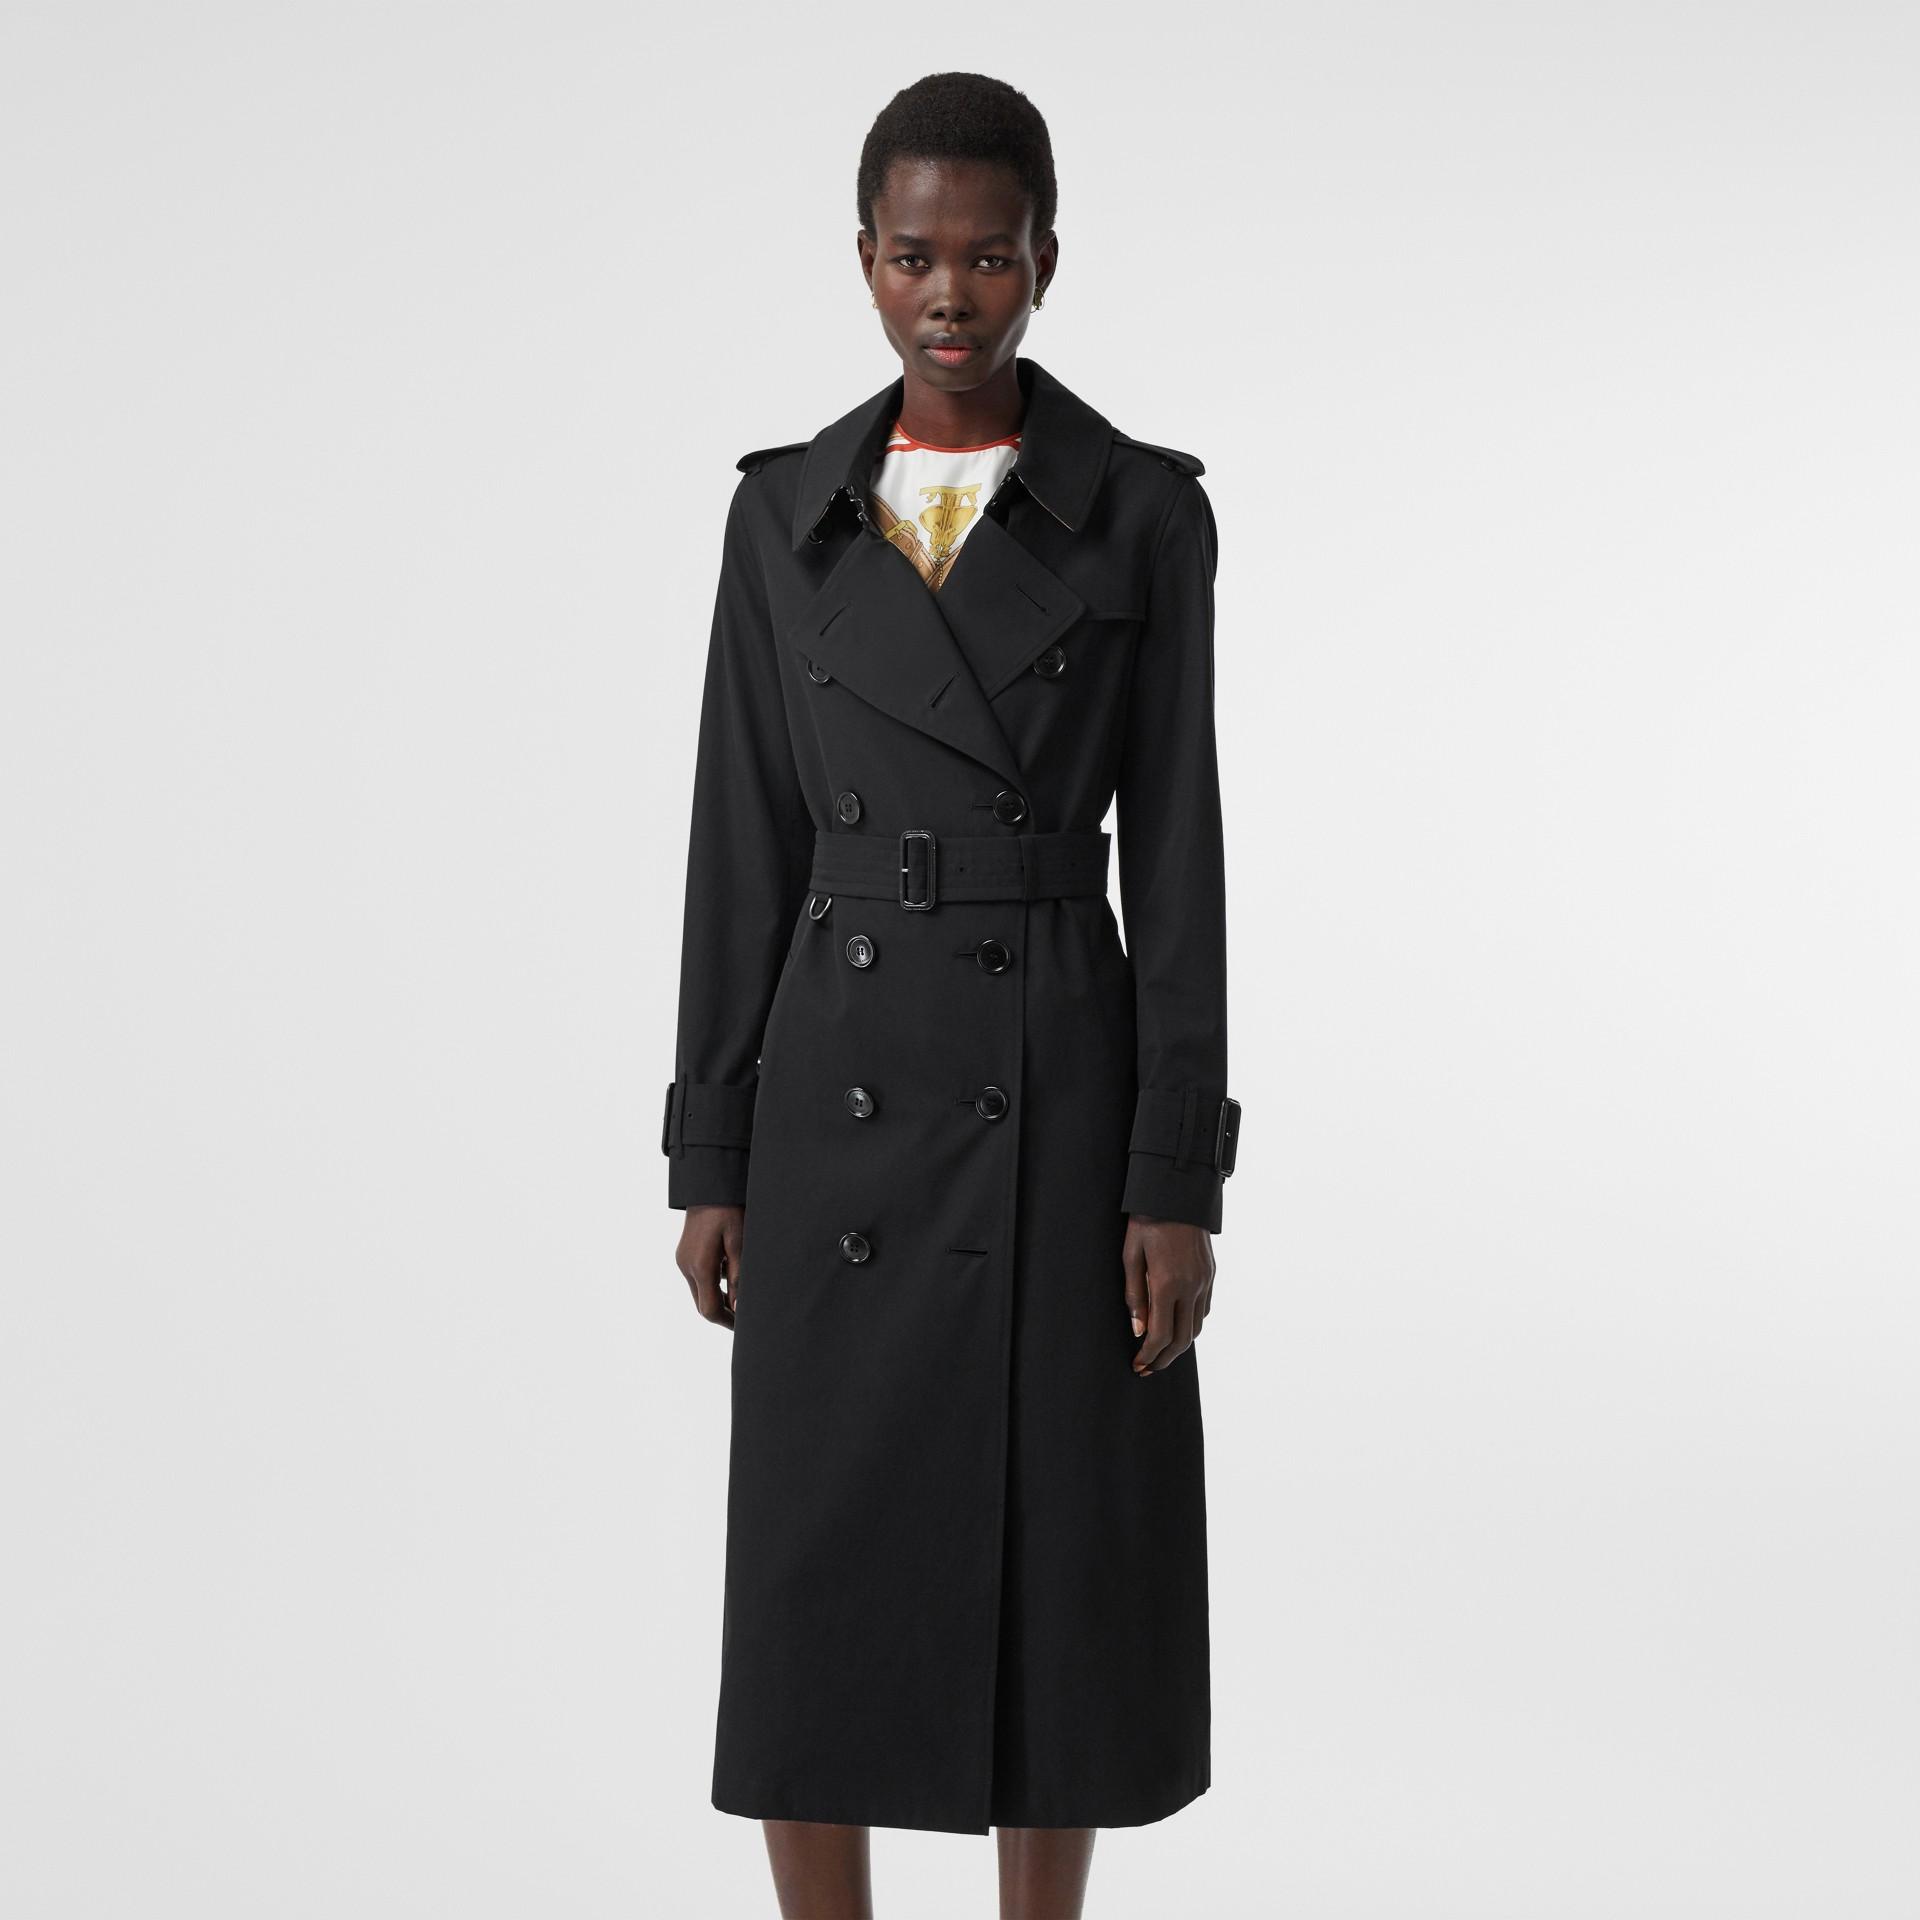 Tropical Gabardine Trench Coat in Black - Women | Burberry United Kingdom - gallery image 7